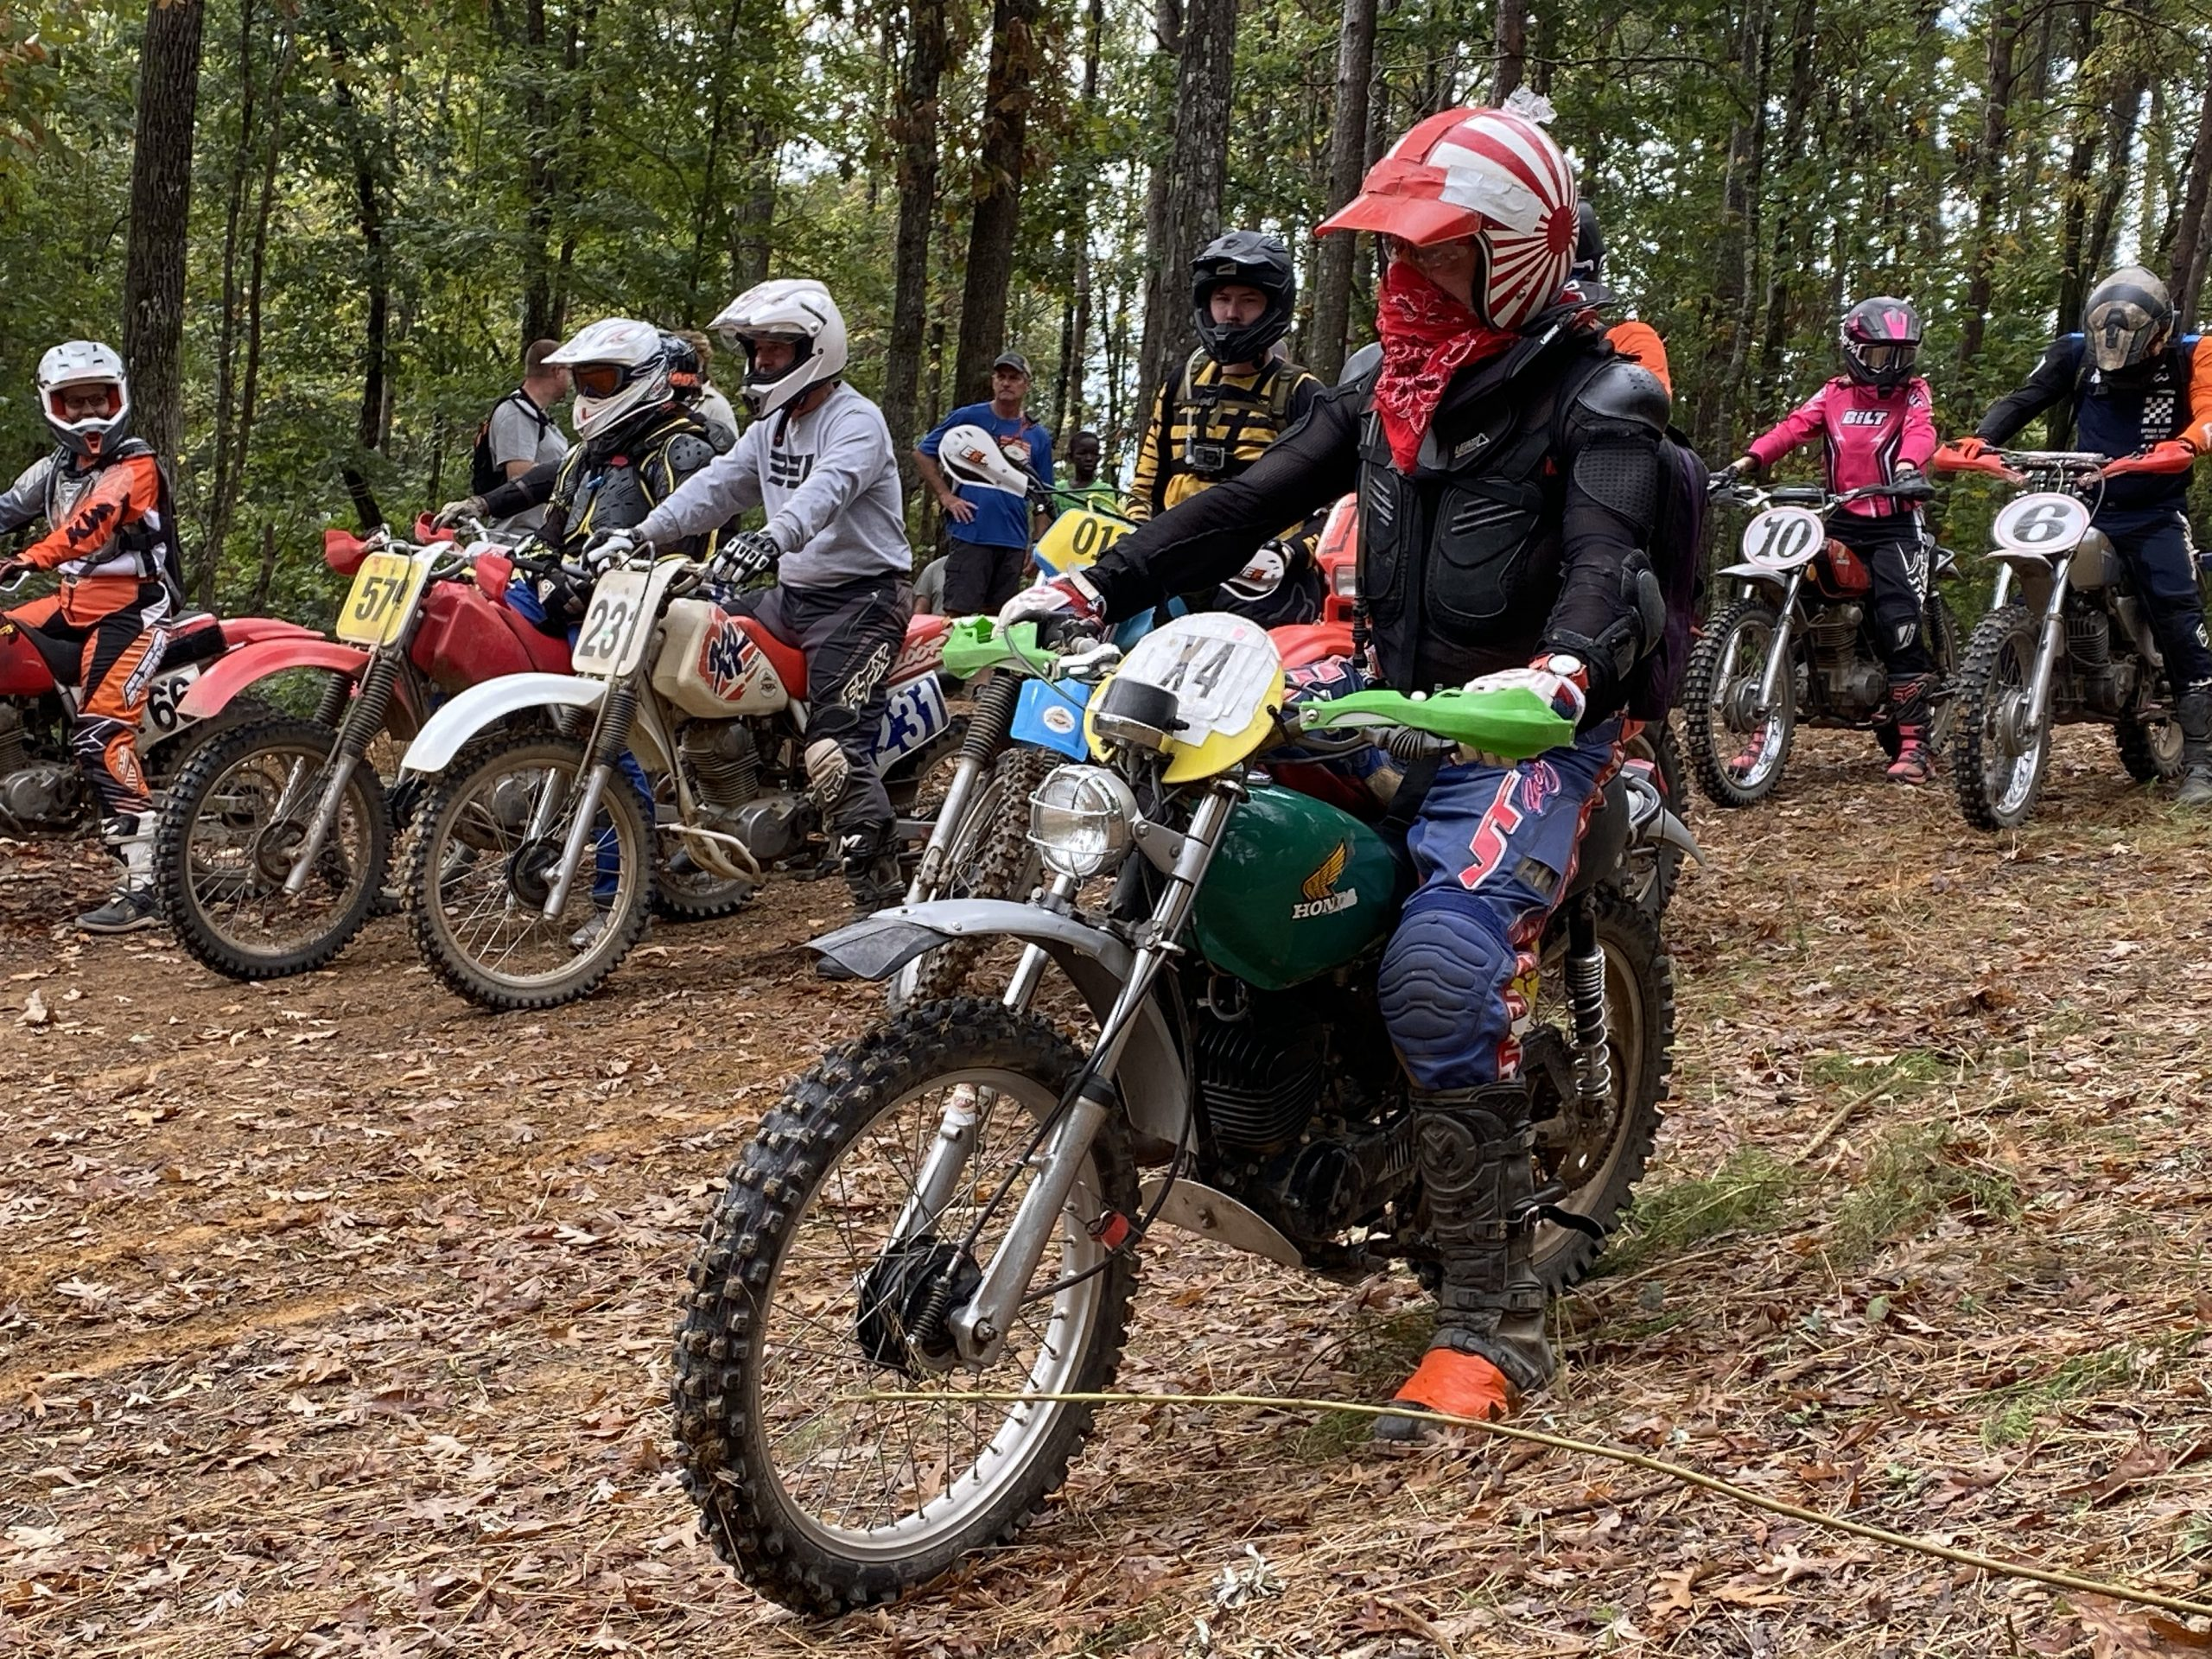 2019 Barber Vintage Festival Moto Riders Ready